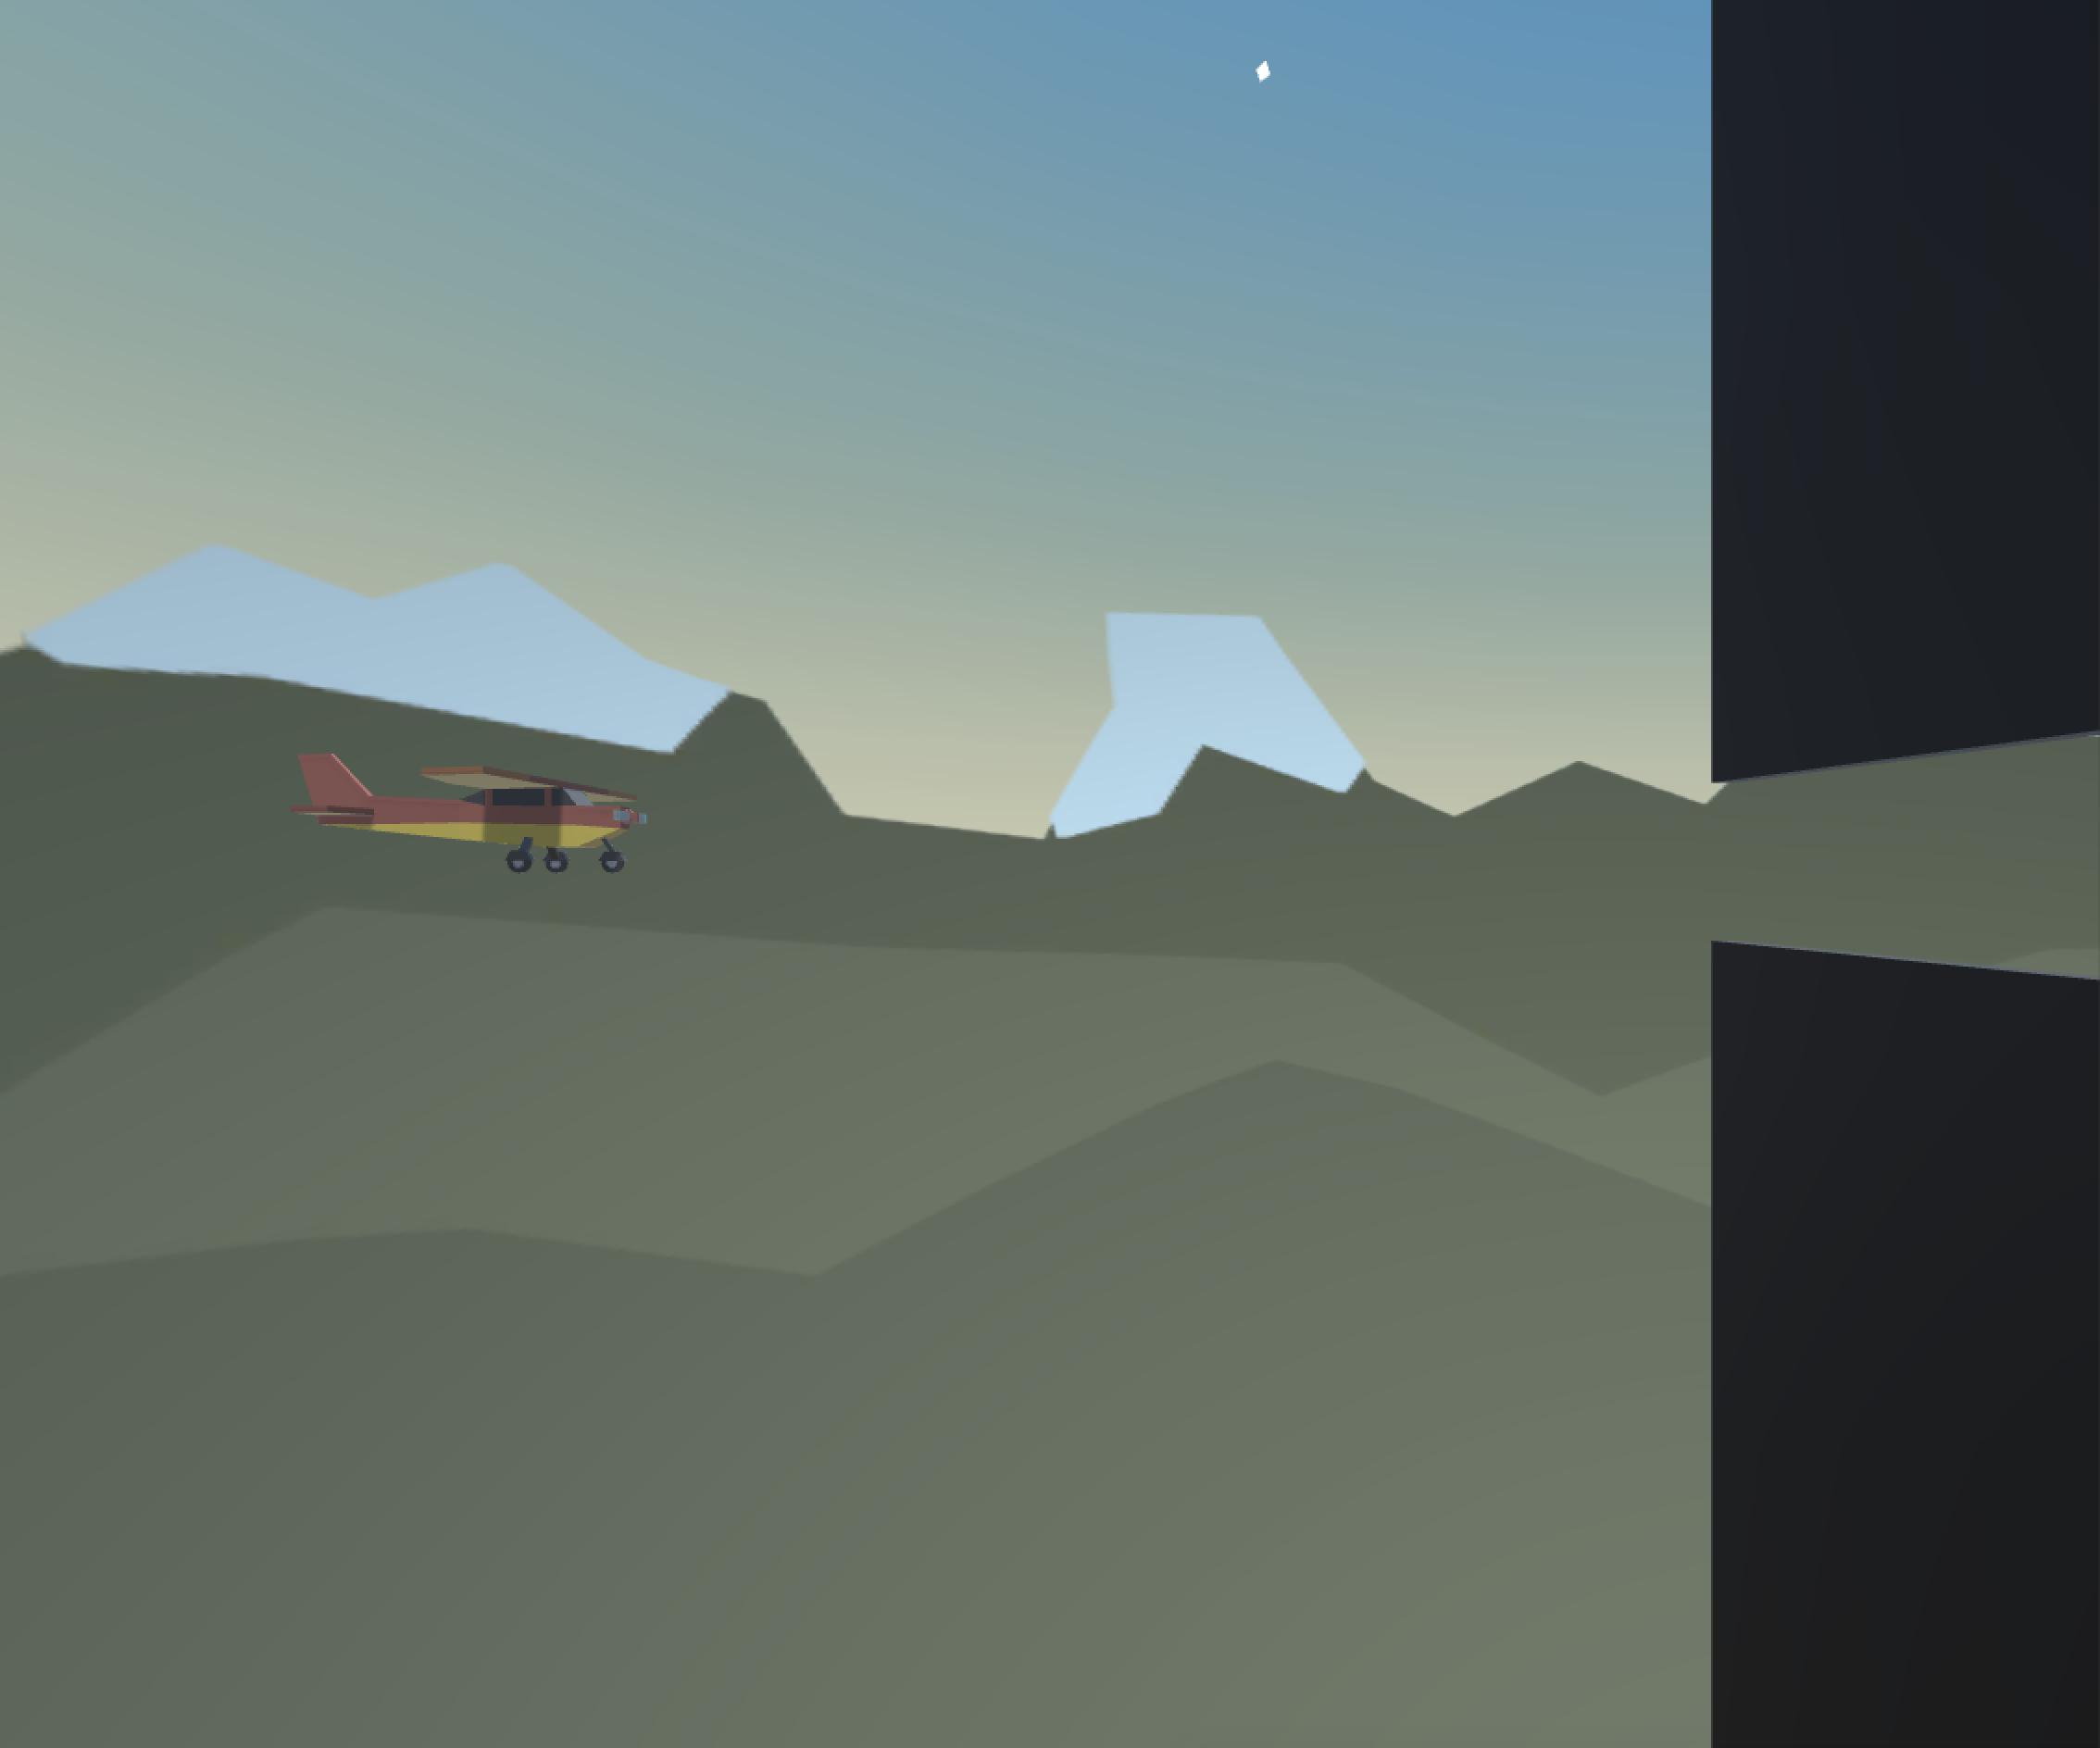 jFanningCWCUnit01-Plane